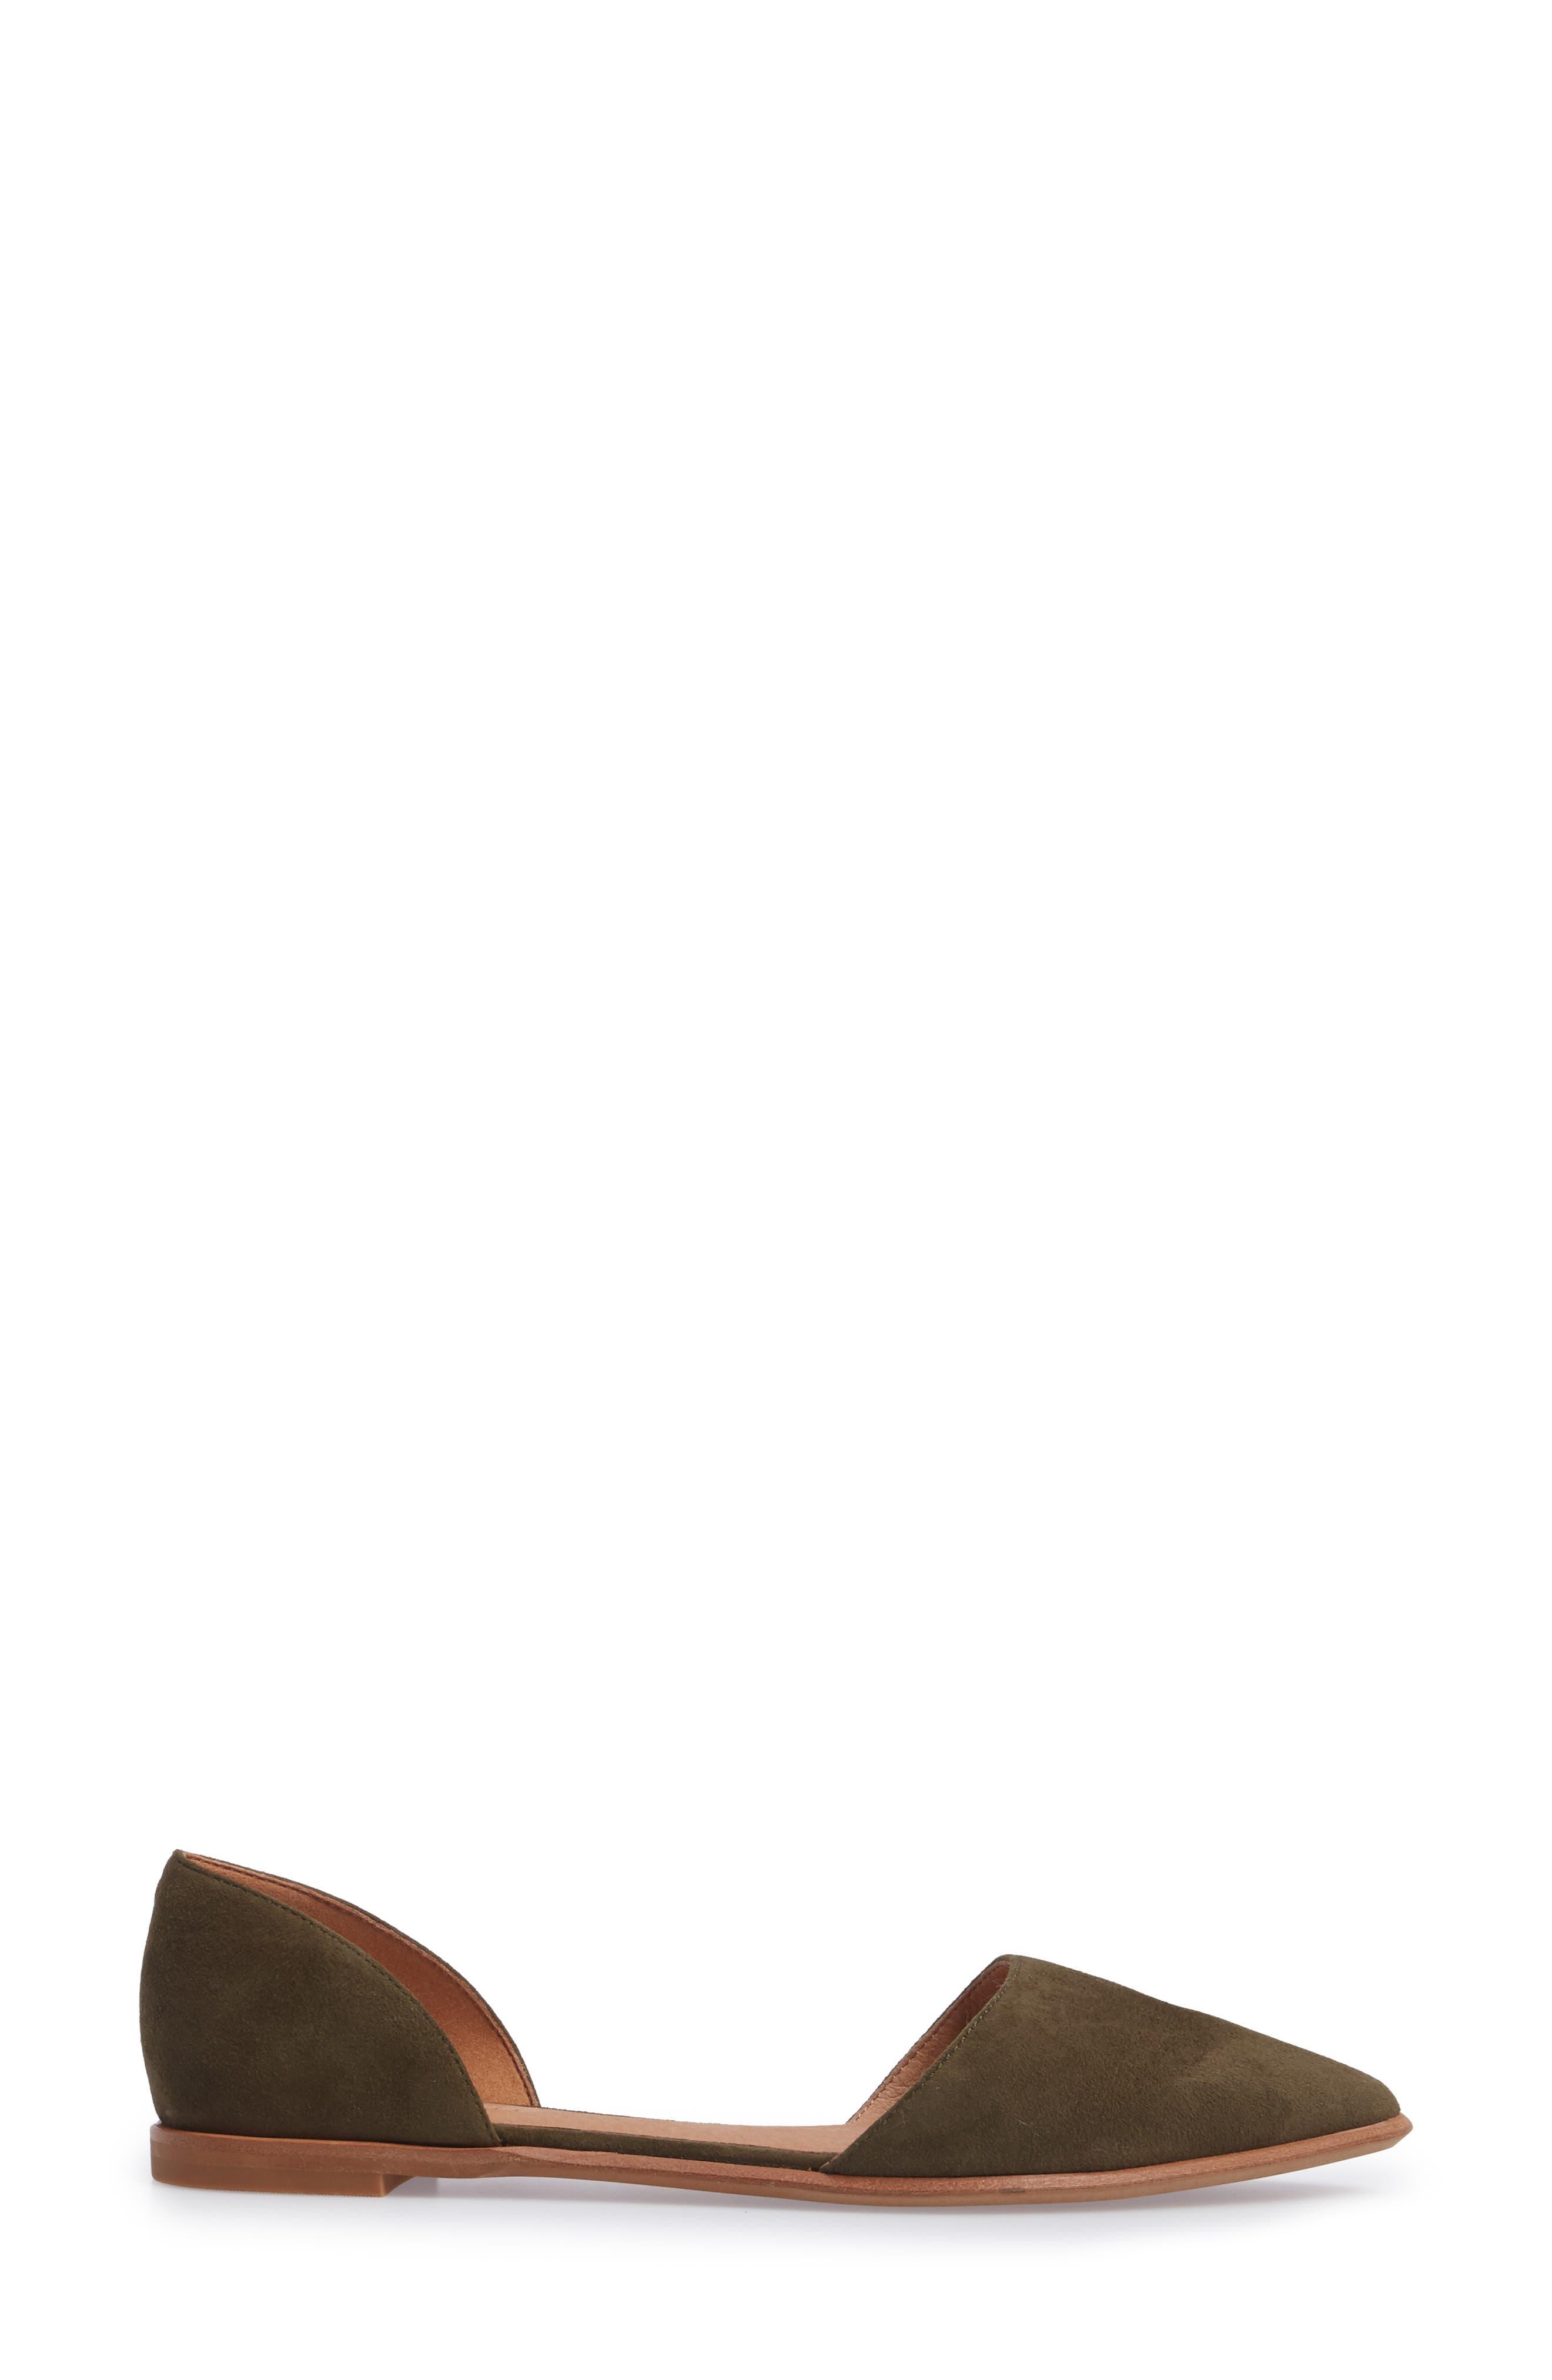 Alternate Image 3  - Madewell Arielle d'Orsay Flat (Women)